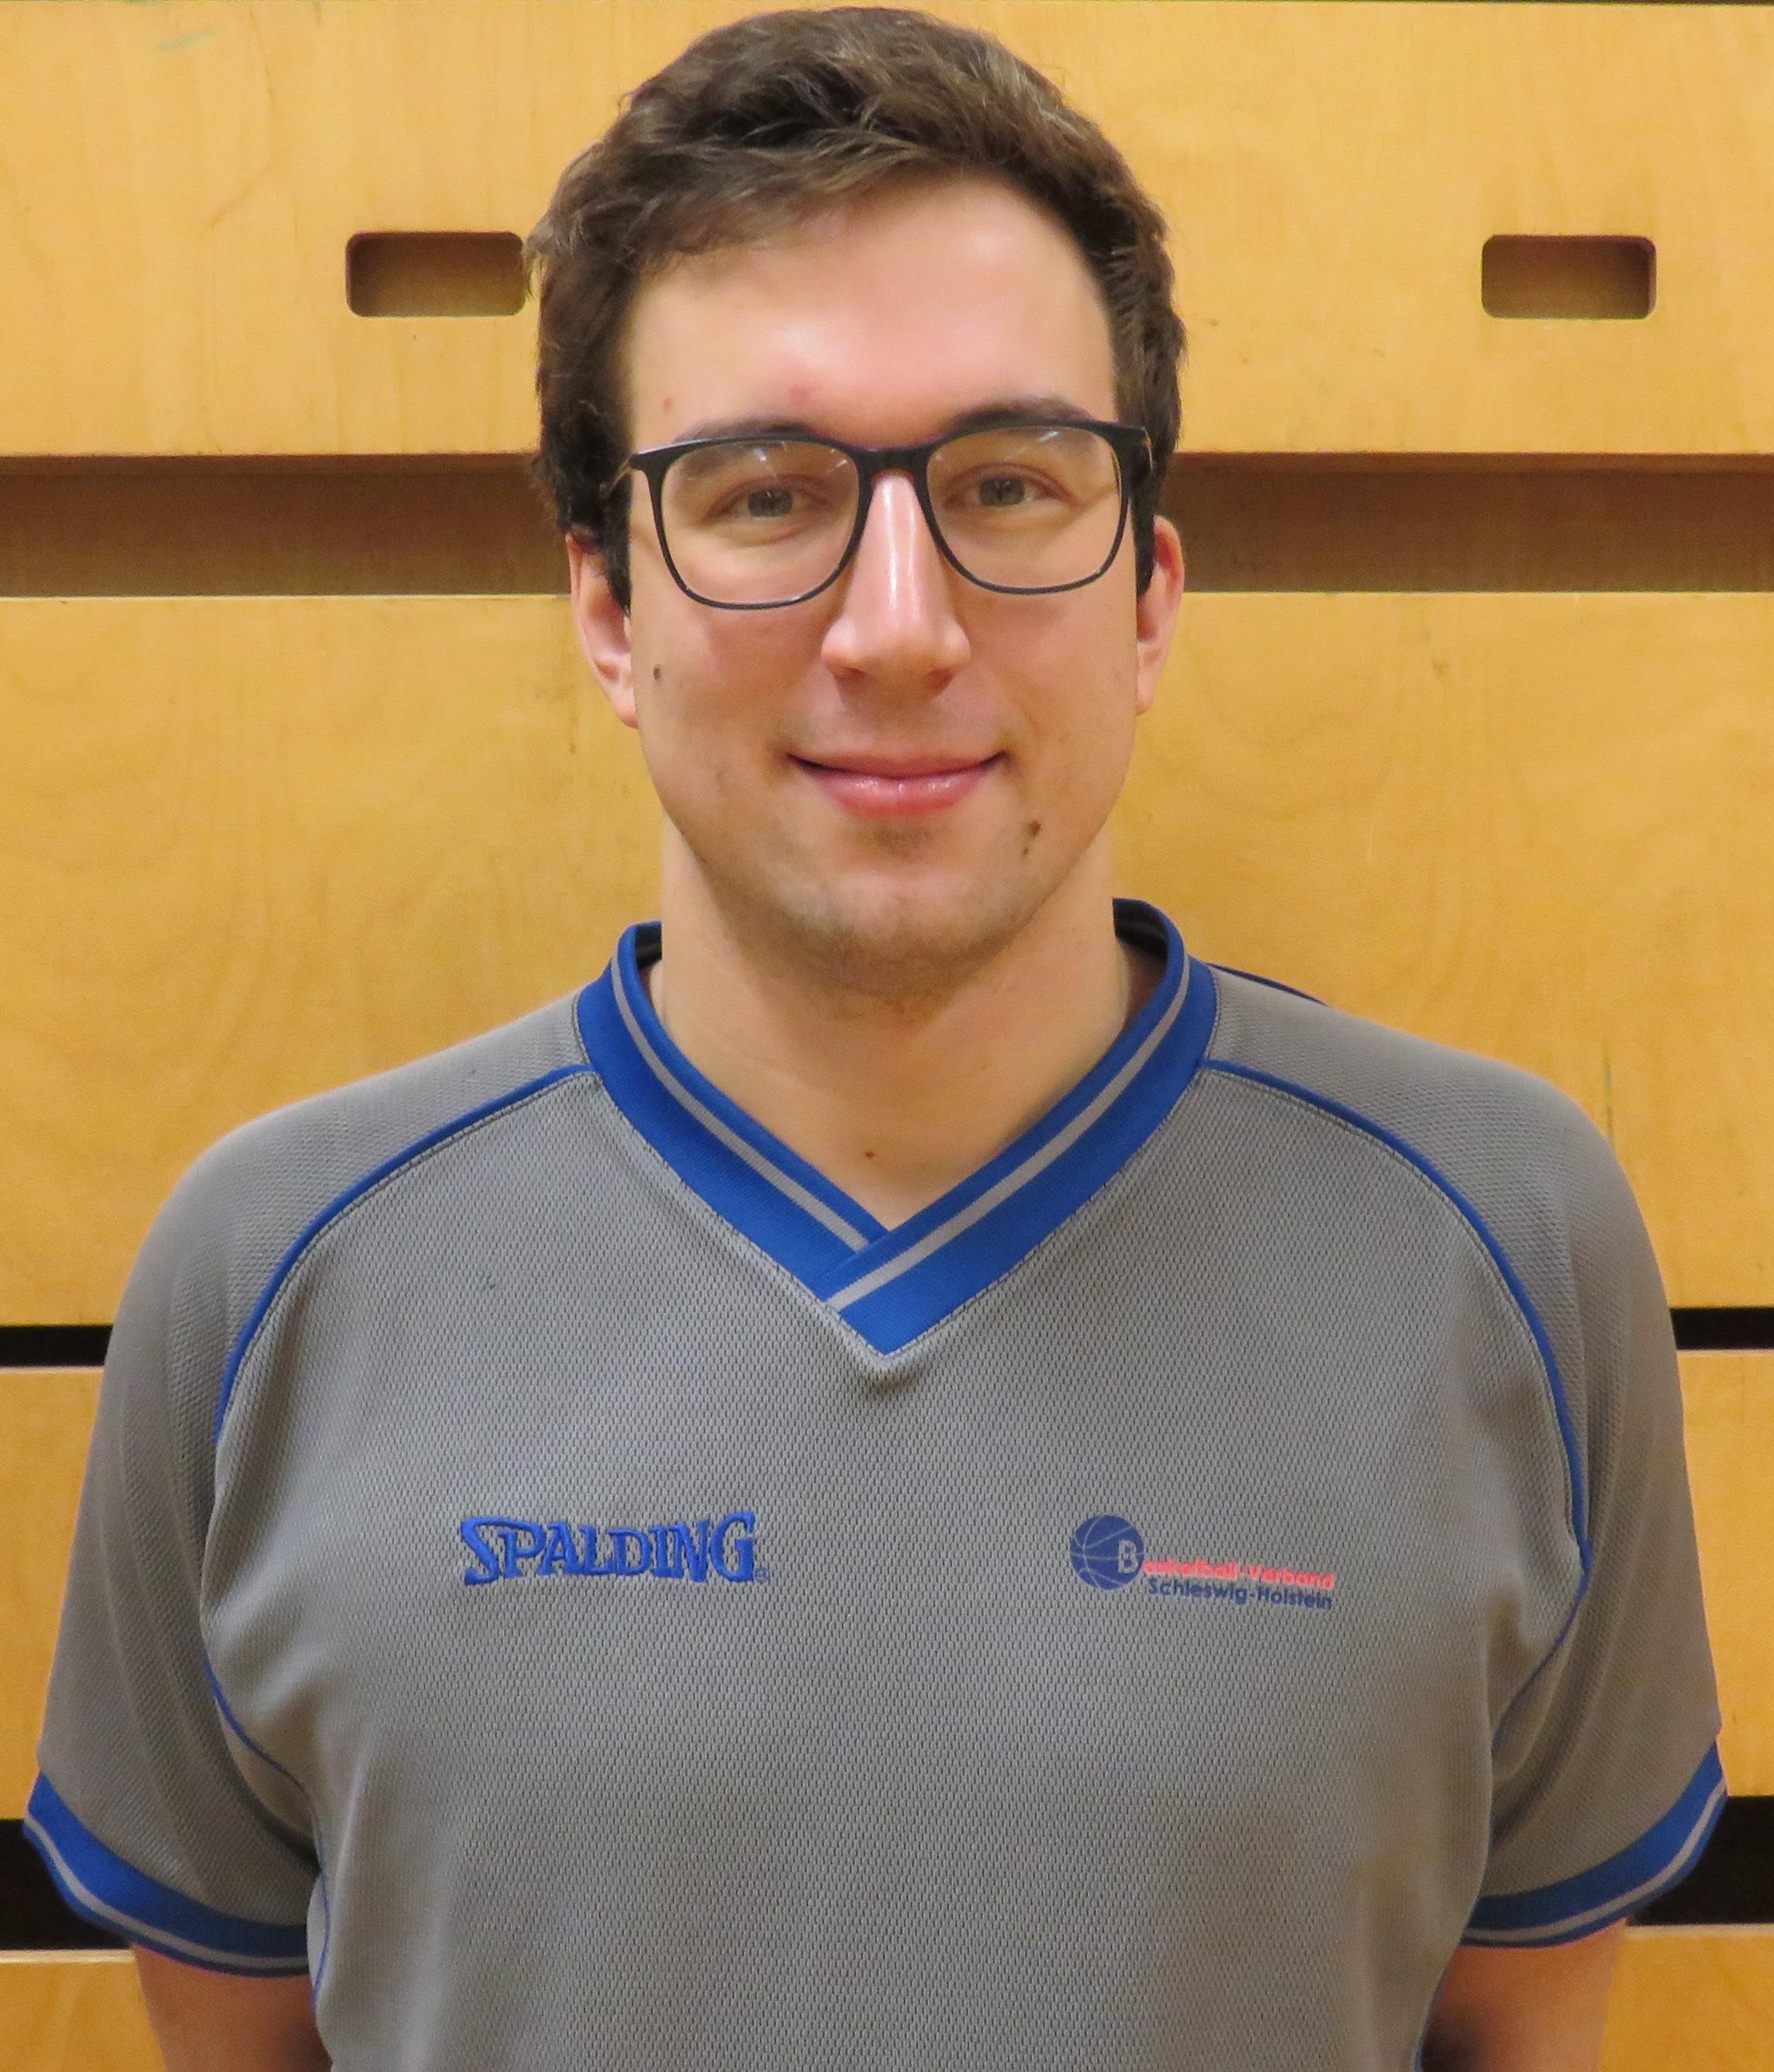 Florian Kunz